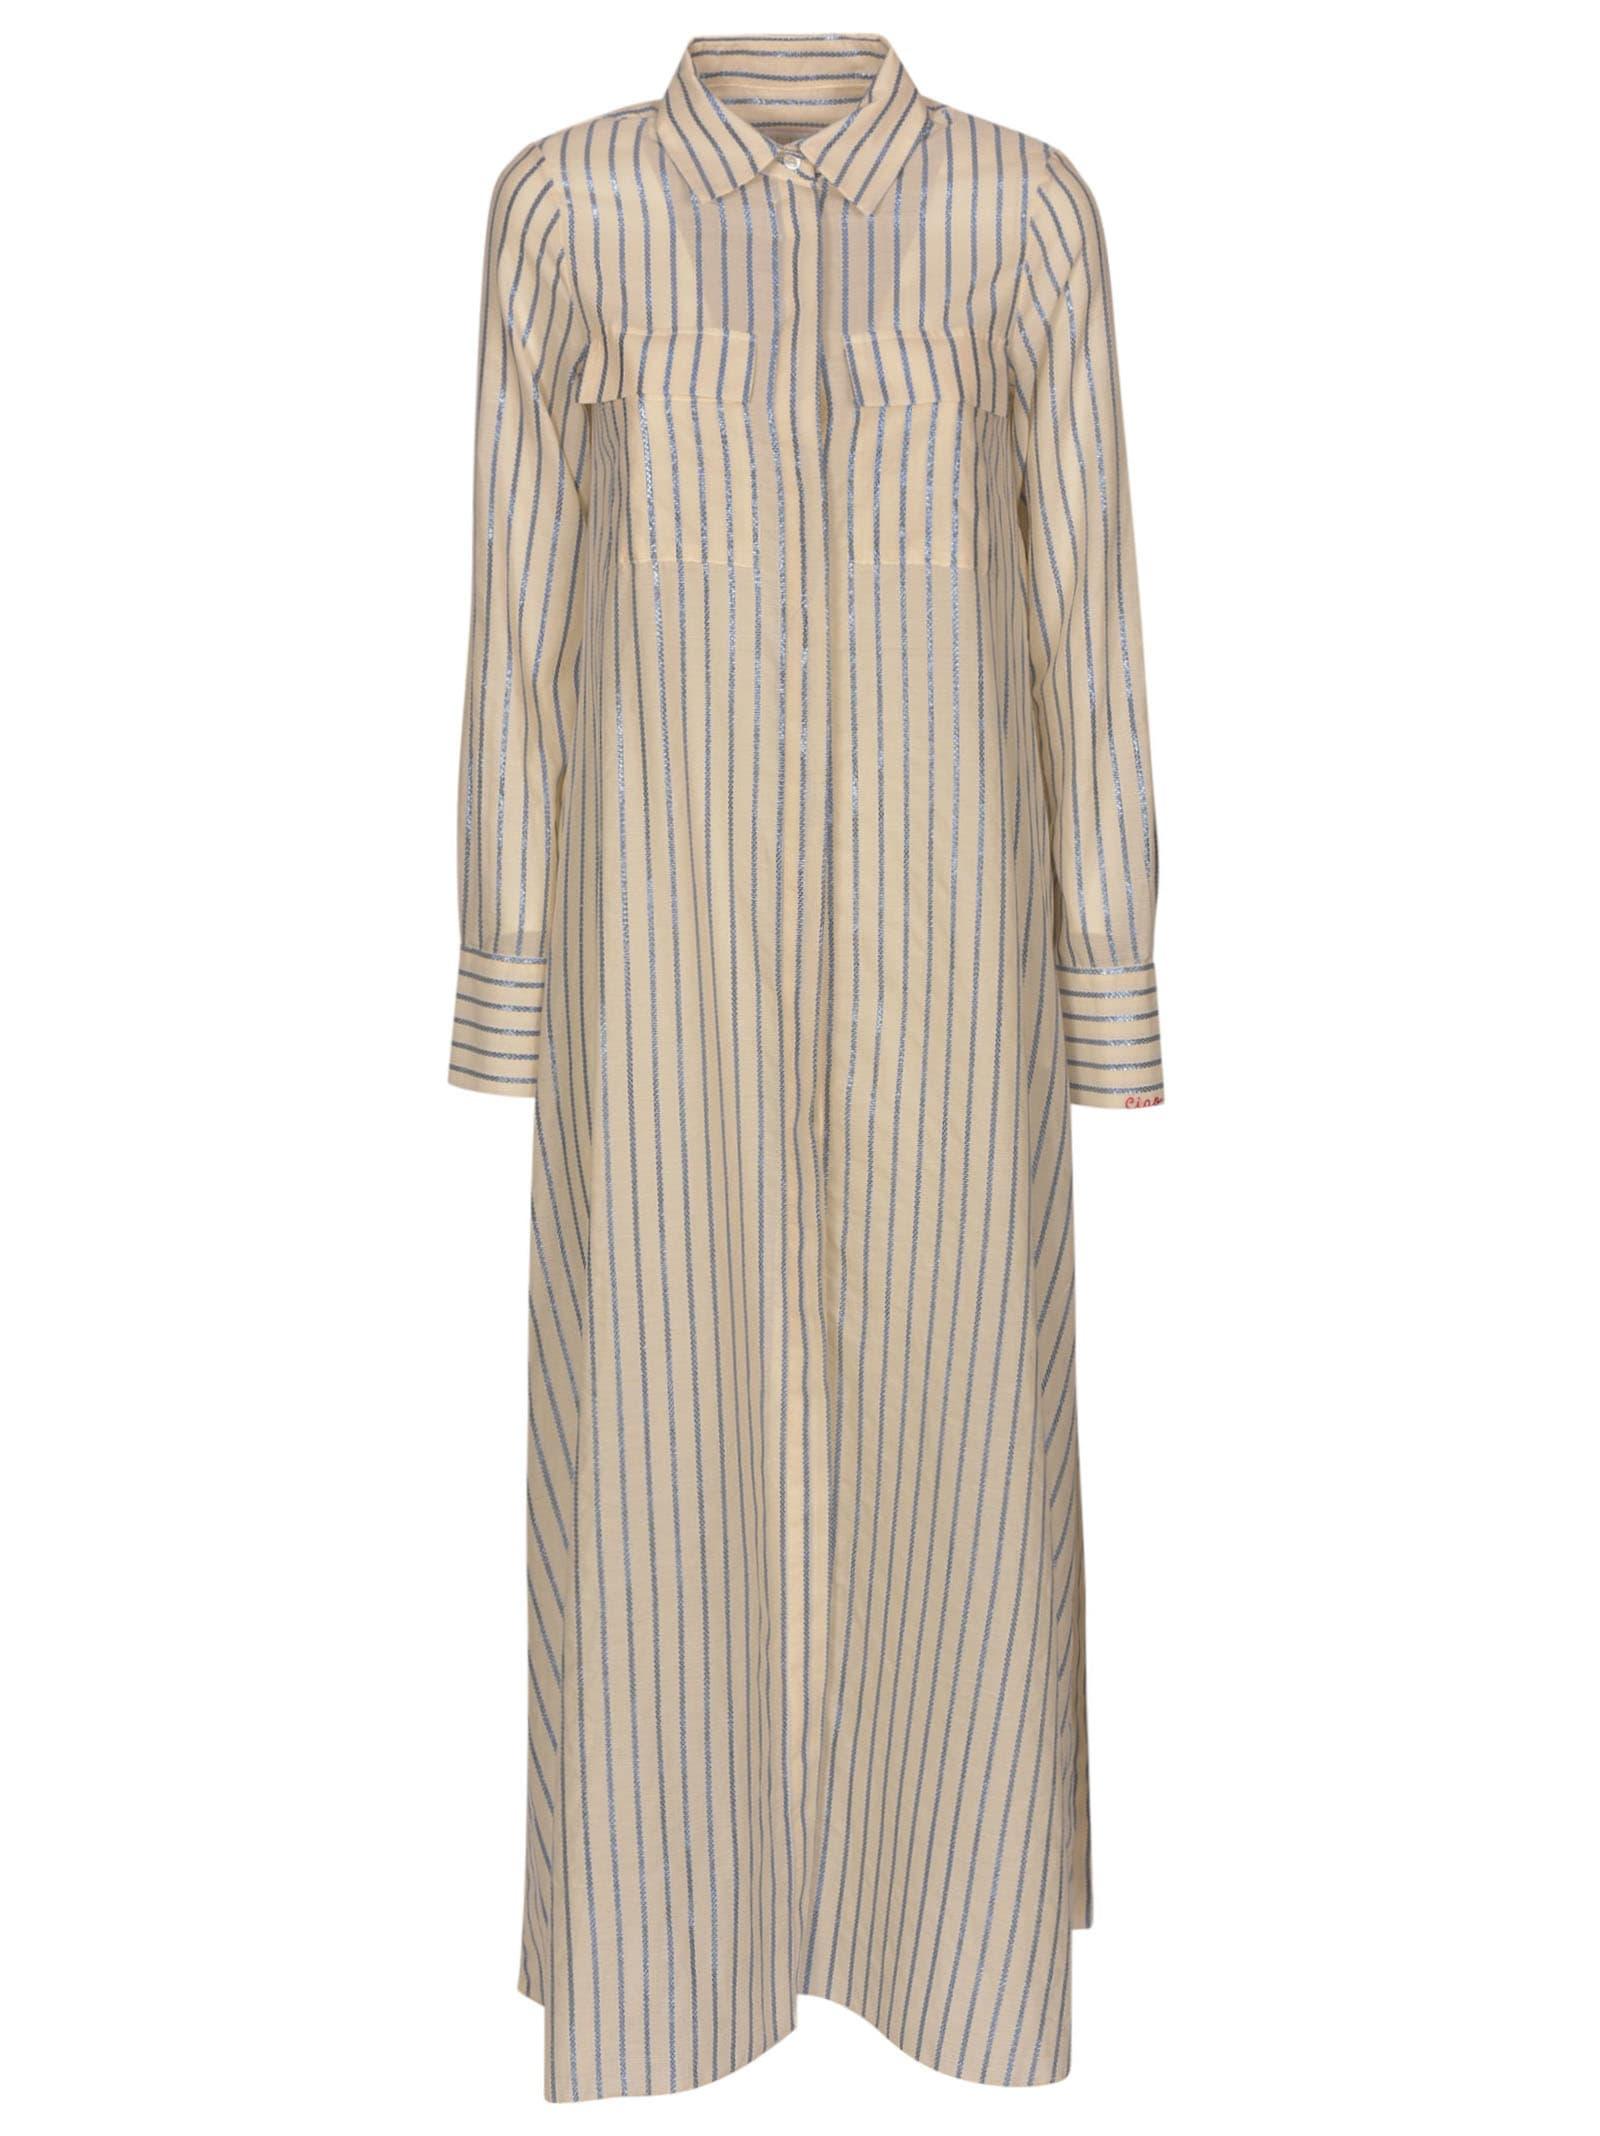 Giada Benincasa Stripe Shirt Dress